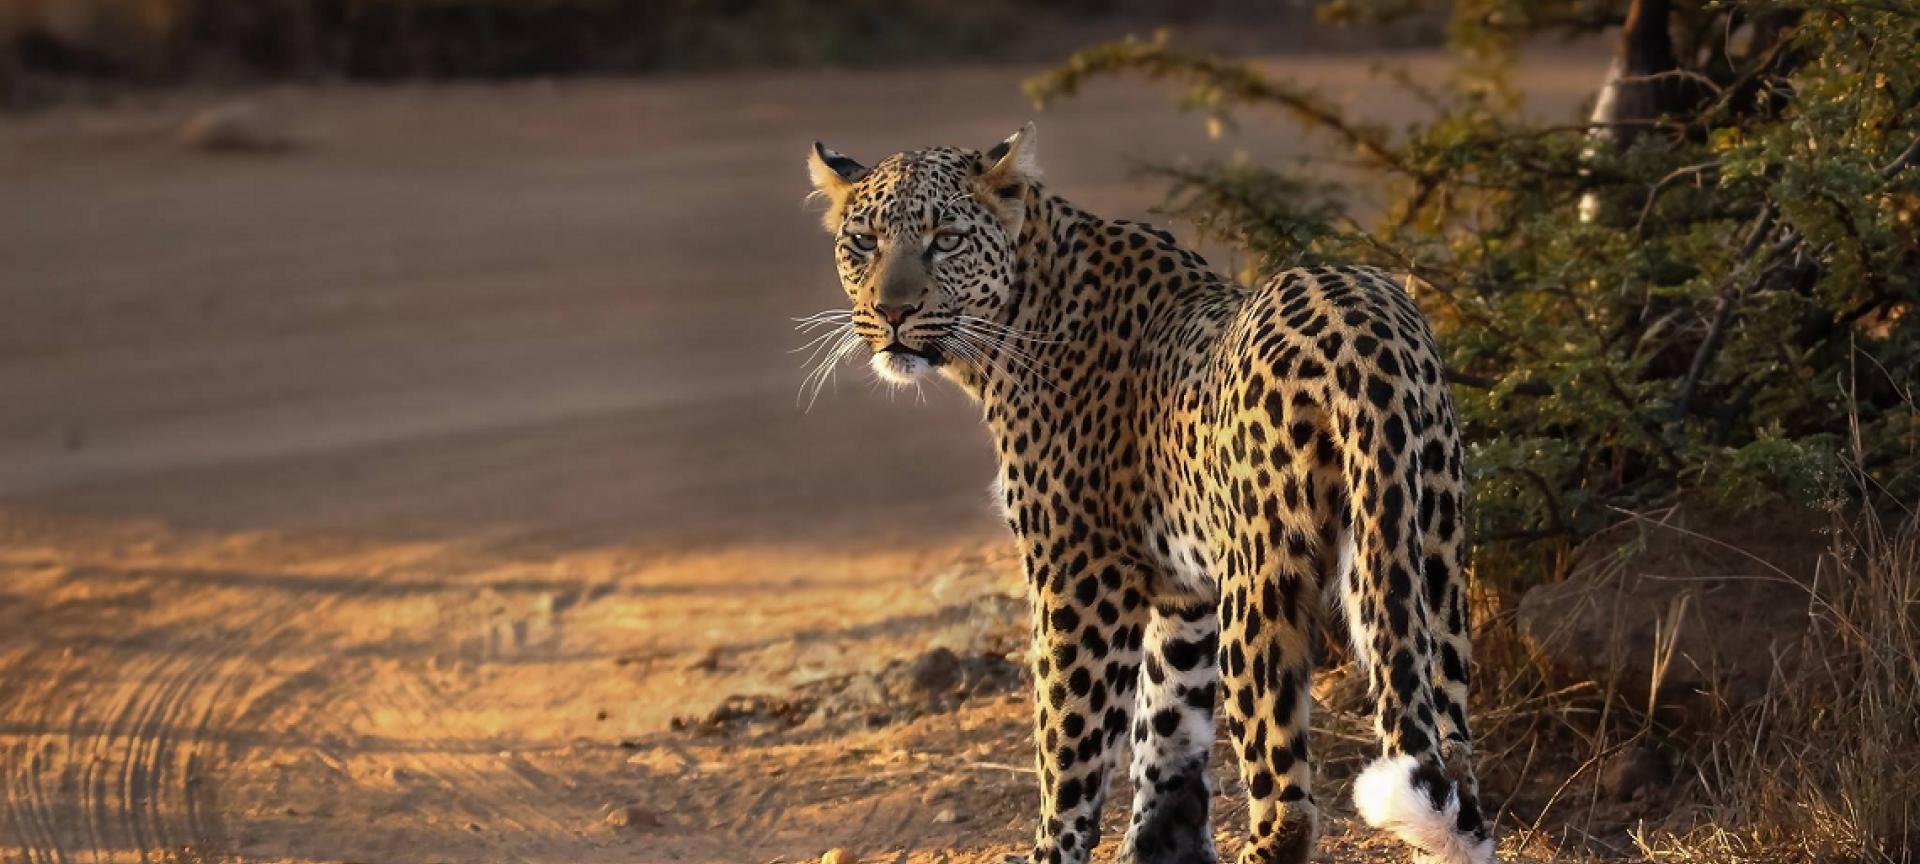 Pilanesberg National Park - Africa Wildlife Safaris